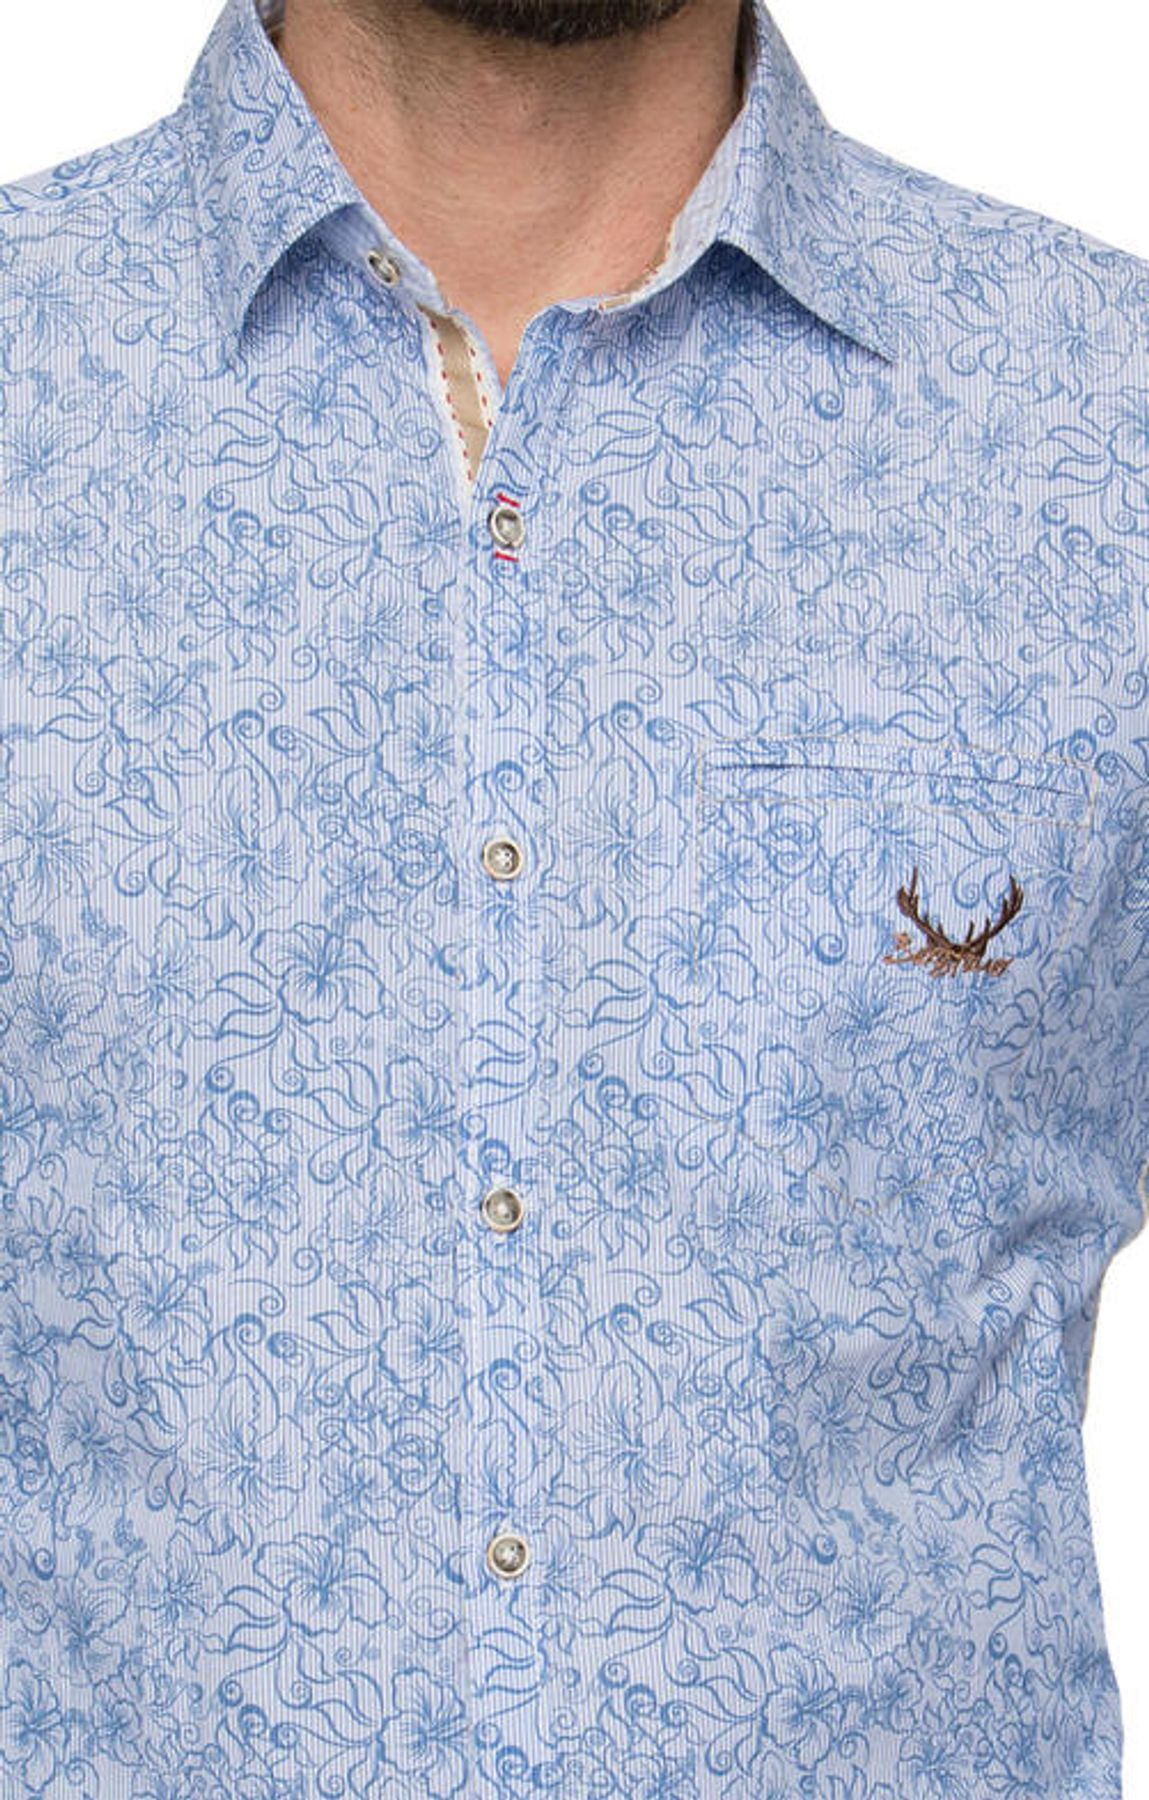 Stockerpoint - Herren Trachtenhemd in Blue stripe, James – Bild 6